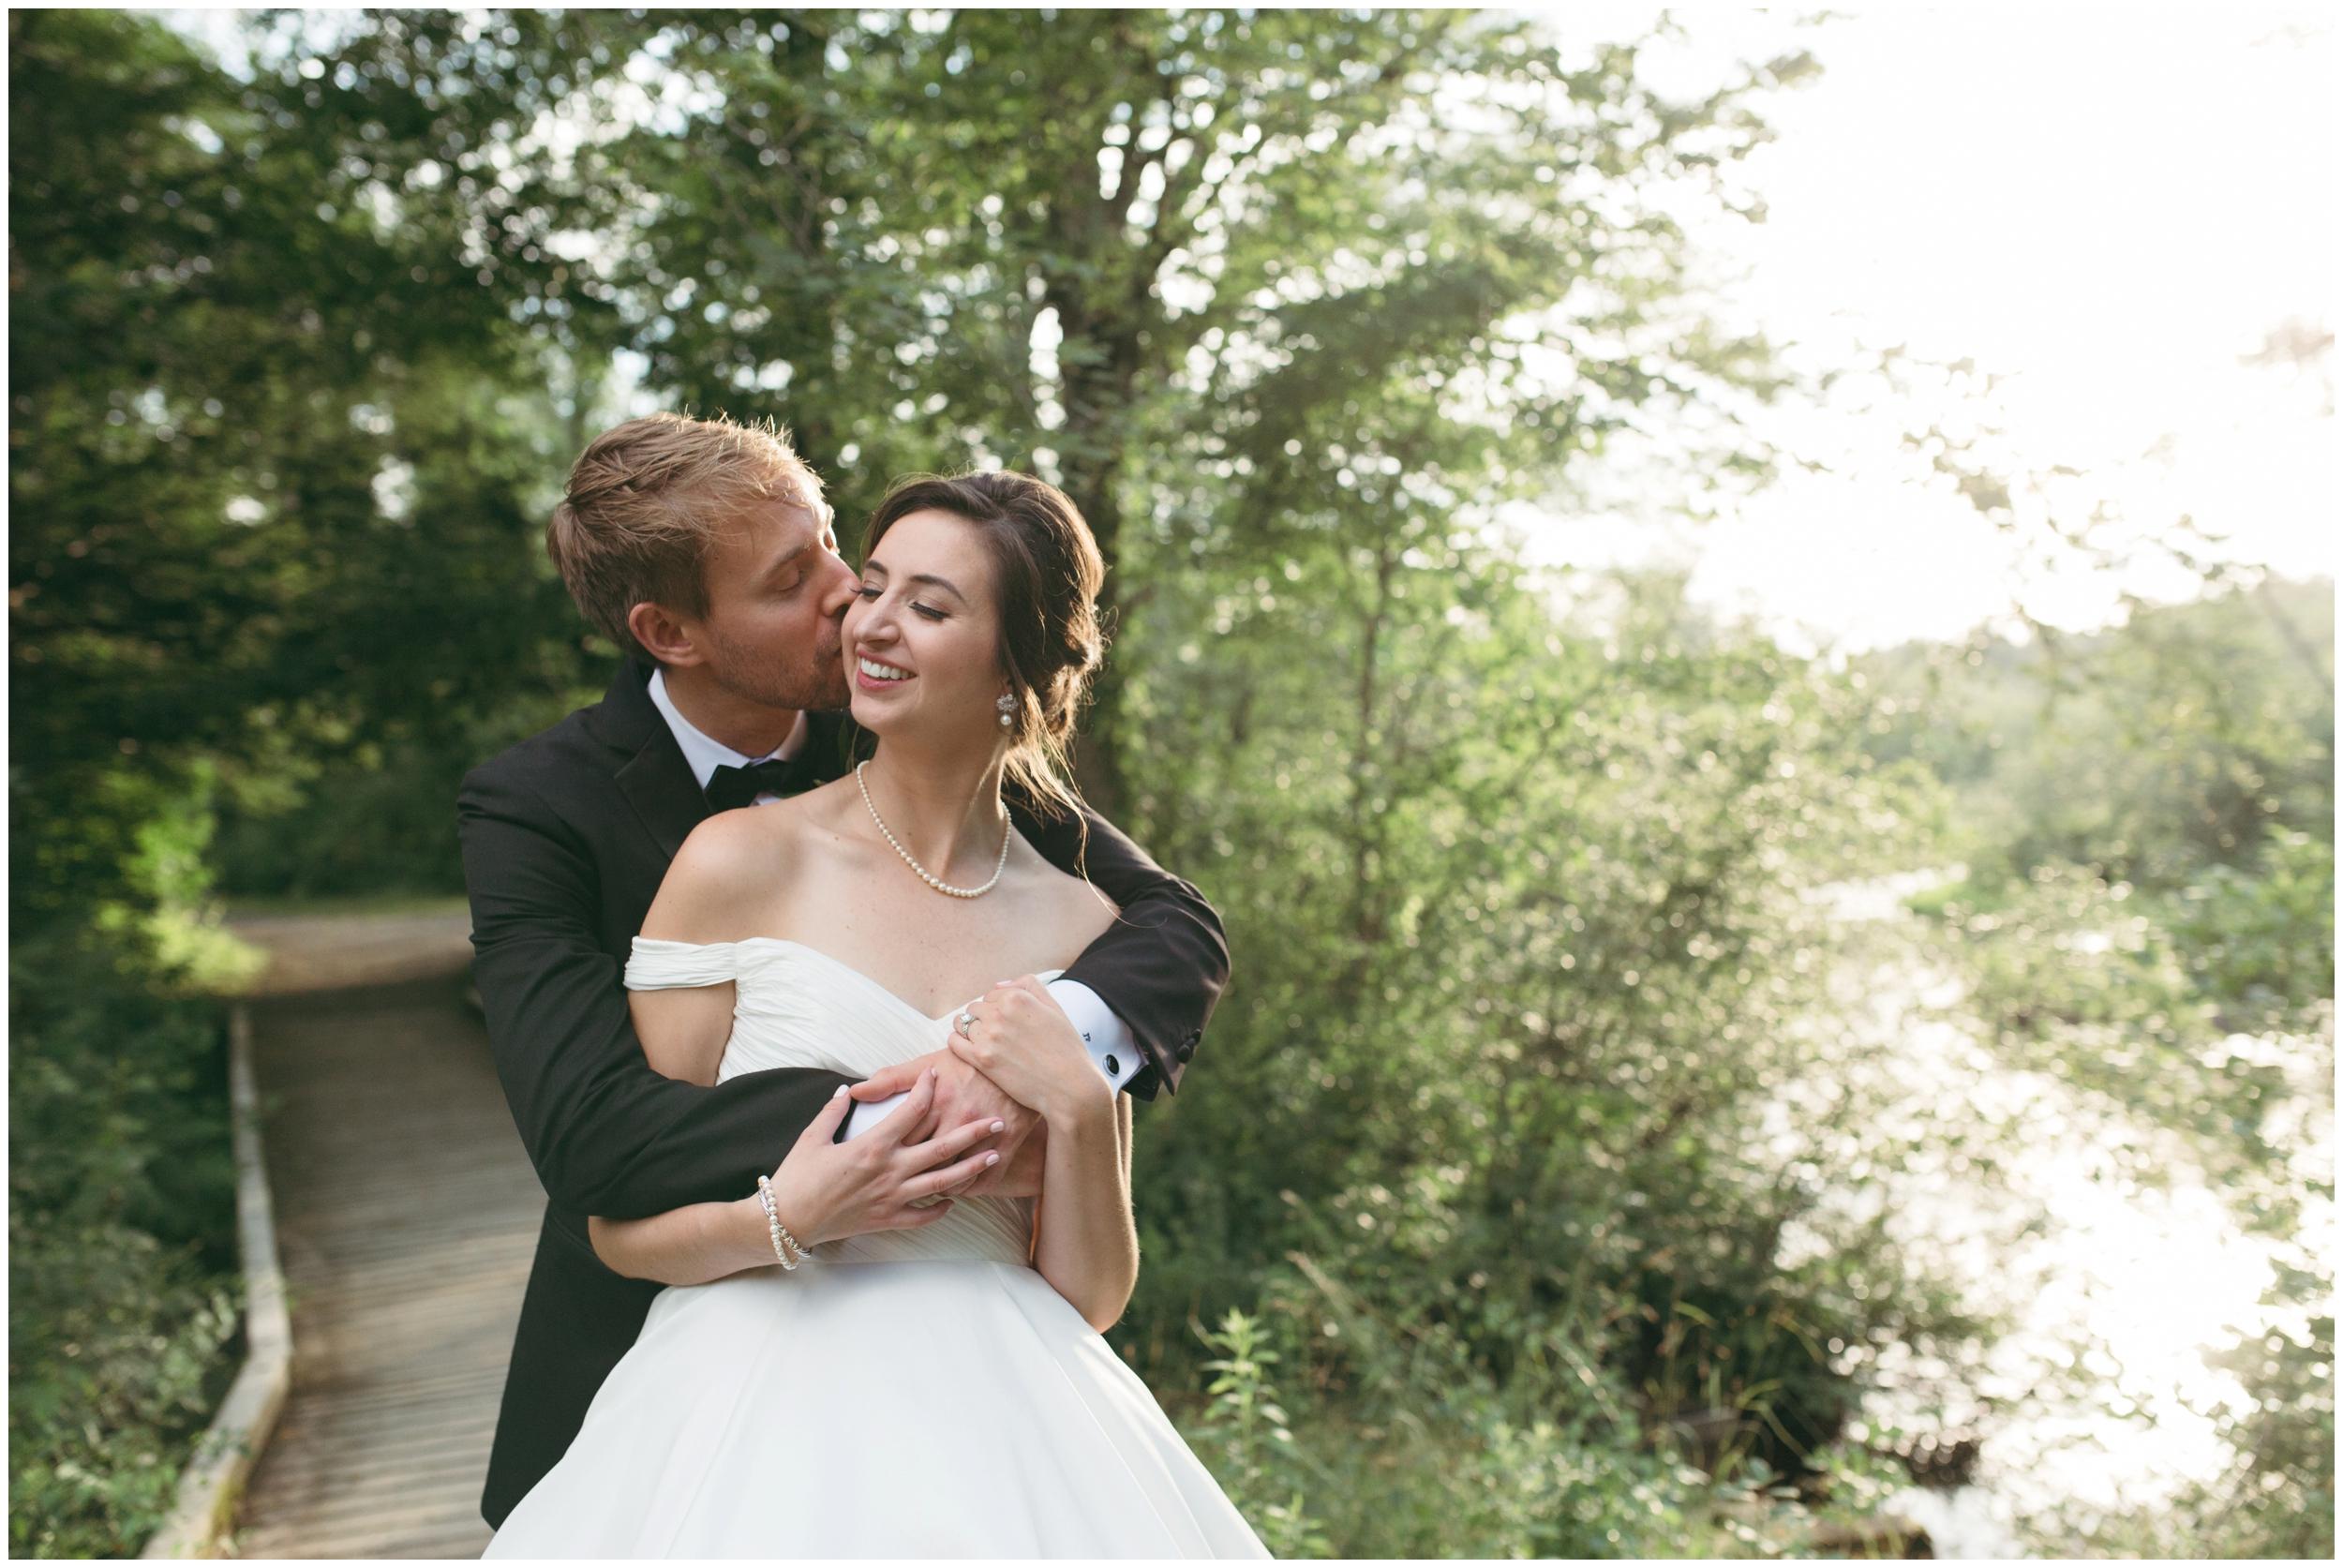 Willowdale-Estate-Wedding-Bailey-Q-Photo-Boston-Wedding-Photographer-067.JPG